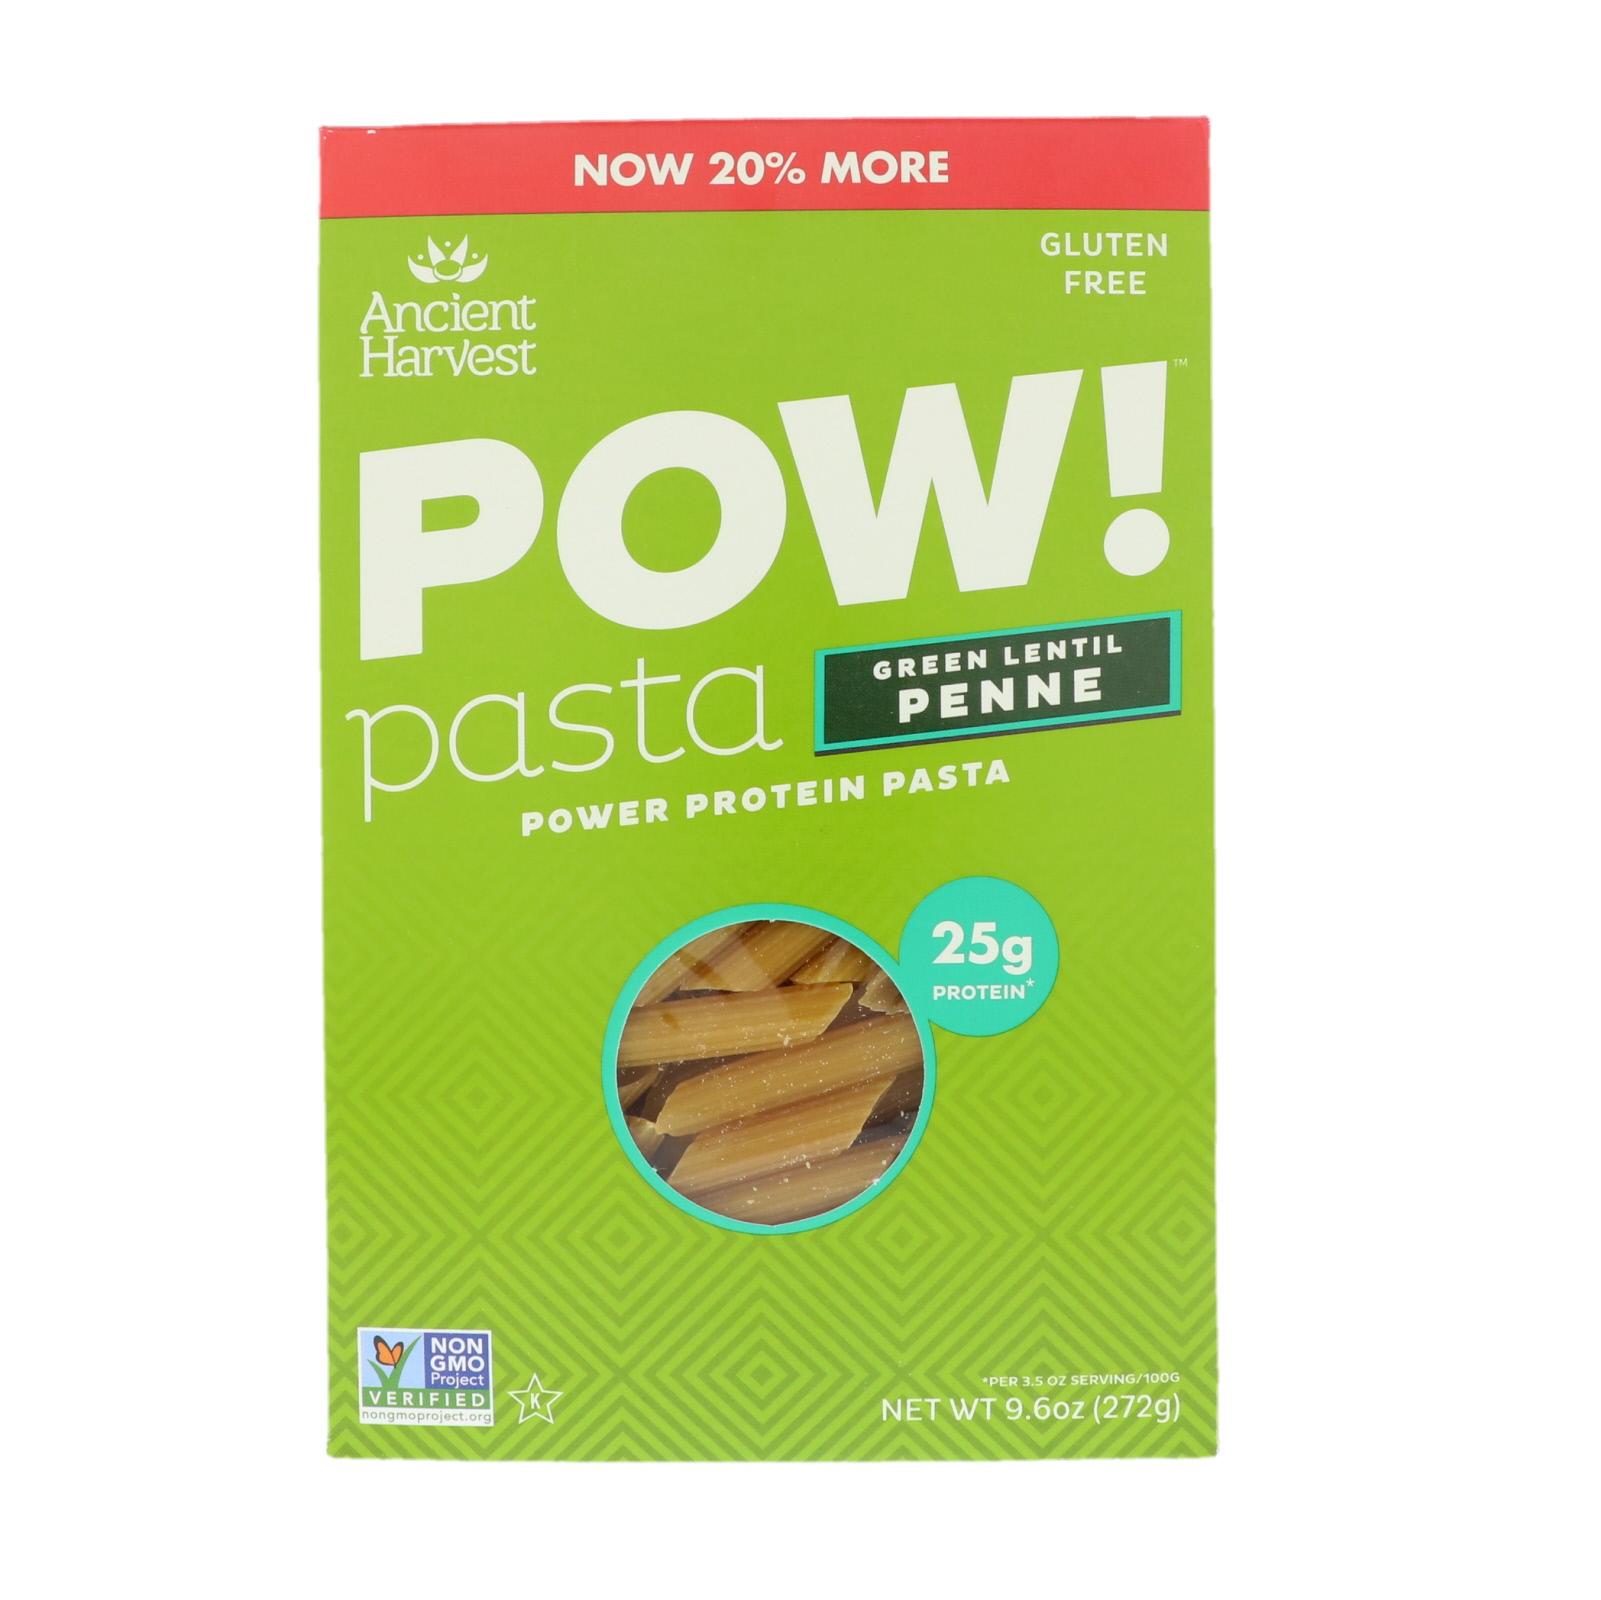 Ancient harvest protein pasta